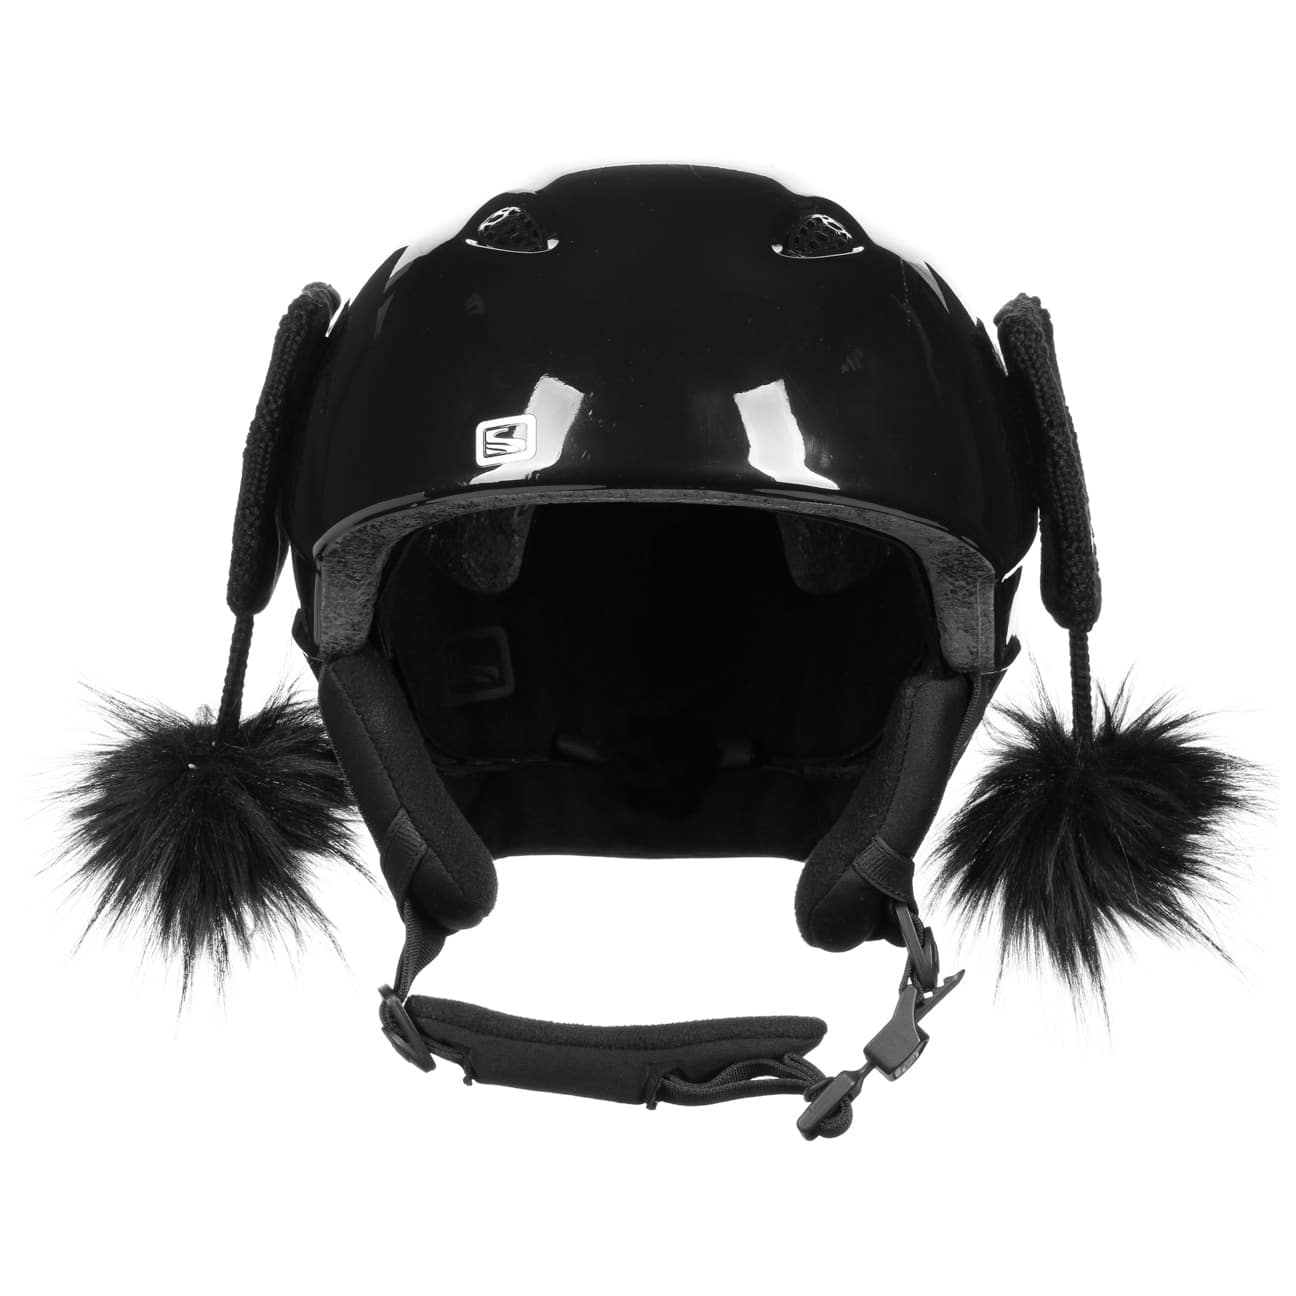 peruvian-luxury-bommel-helmaufkleber-by-eisbar, 29.99 EUR @ hutshopping-de